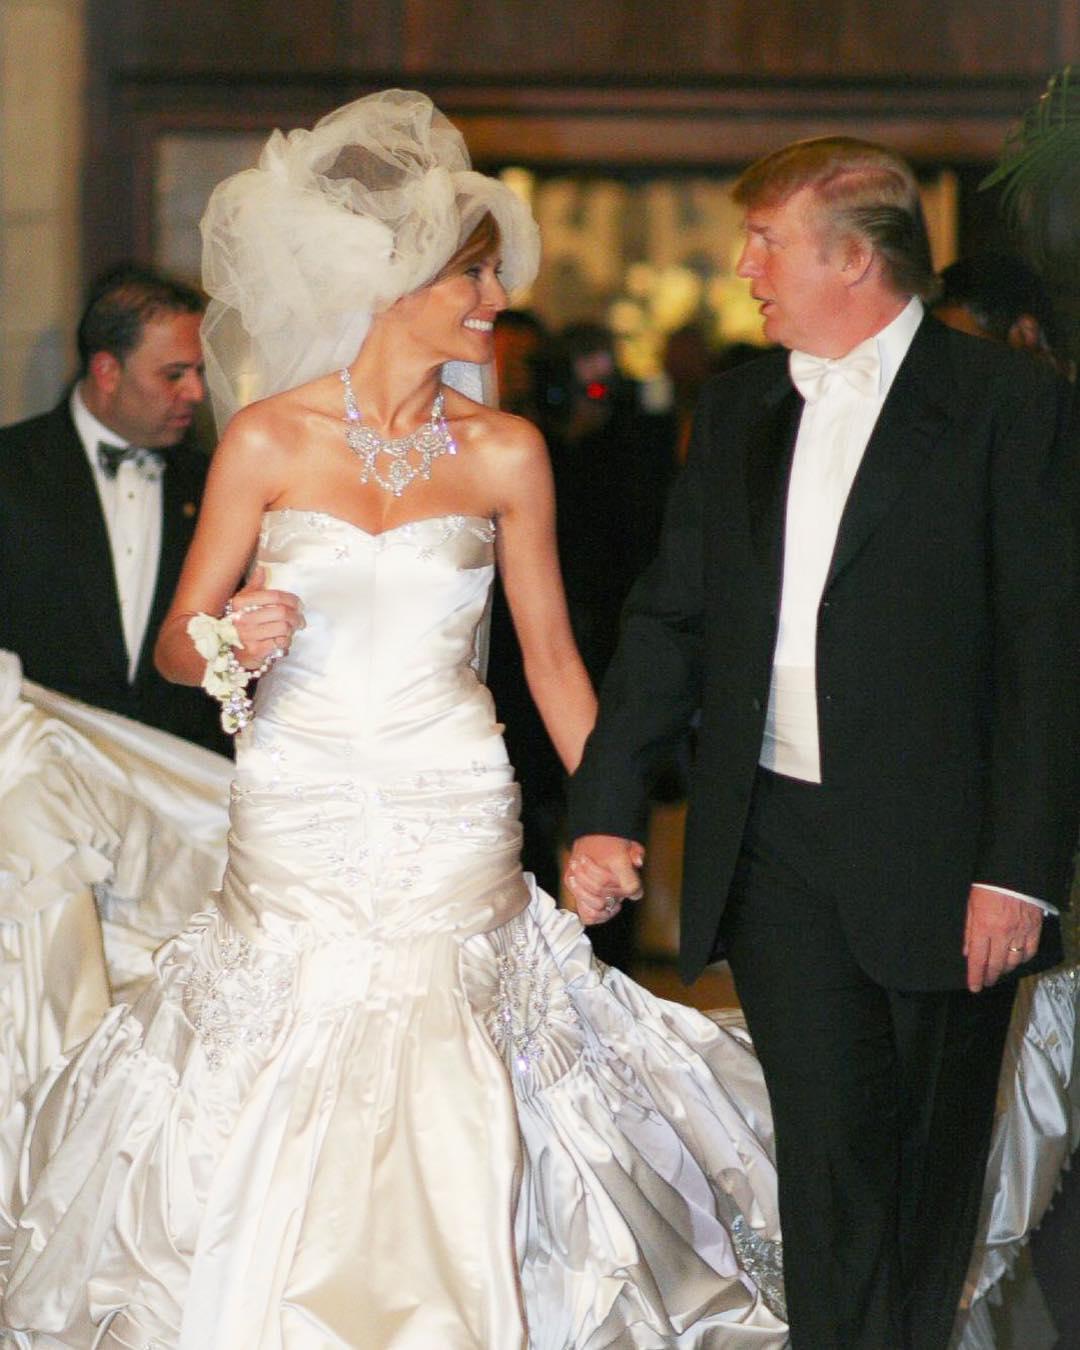 мелания трамп свадьба фото жизнь